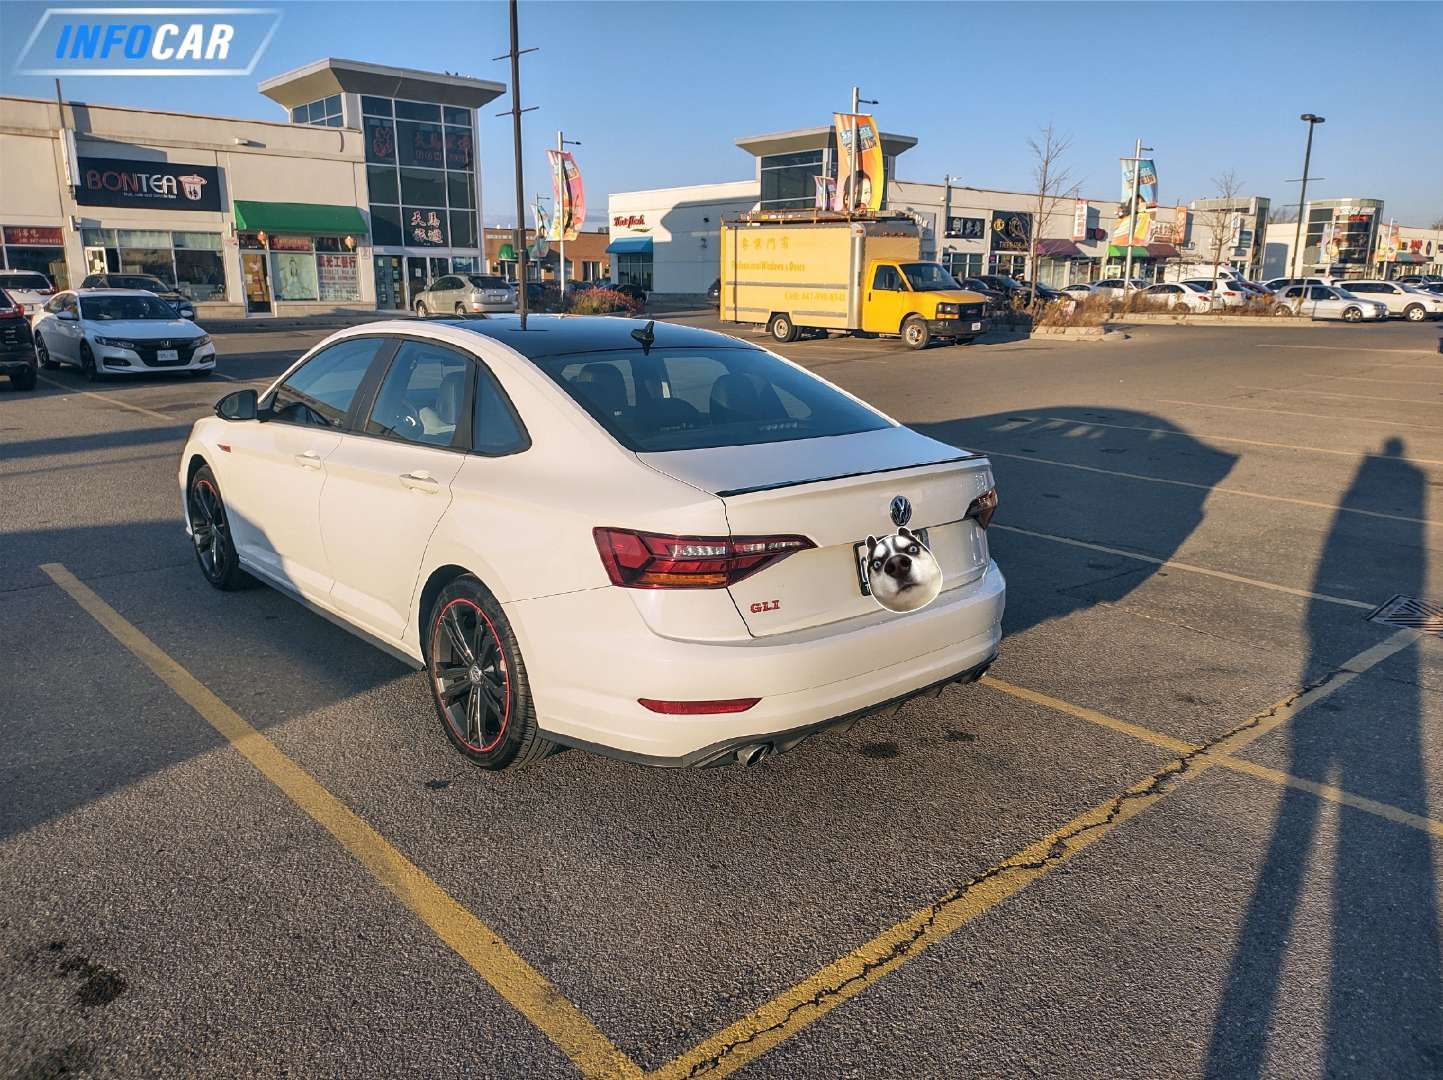 2019 Volkswagen Jetta GLI - INFOCAR - Toronto's Most Comprehensive New and Used Auto Trading Platform